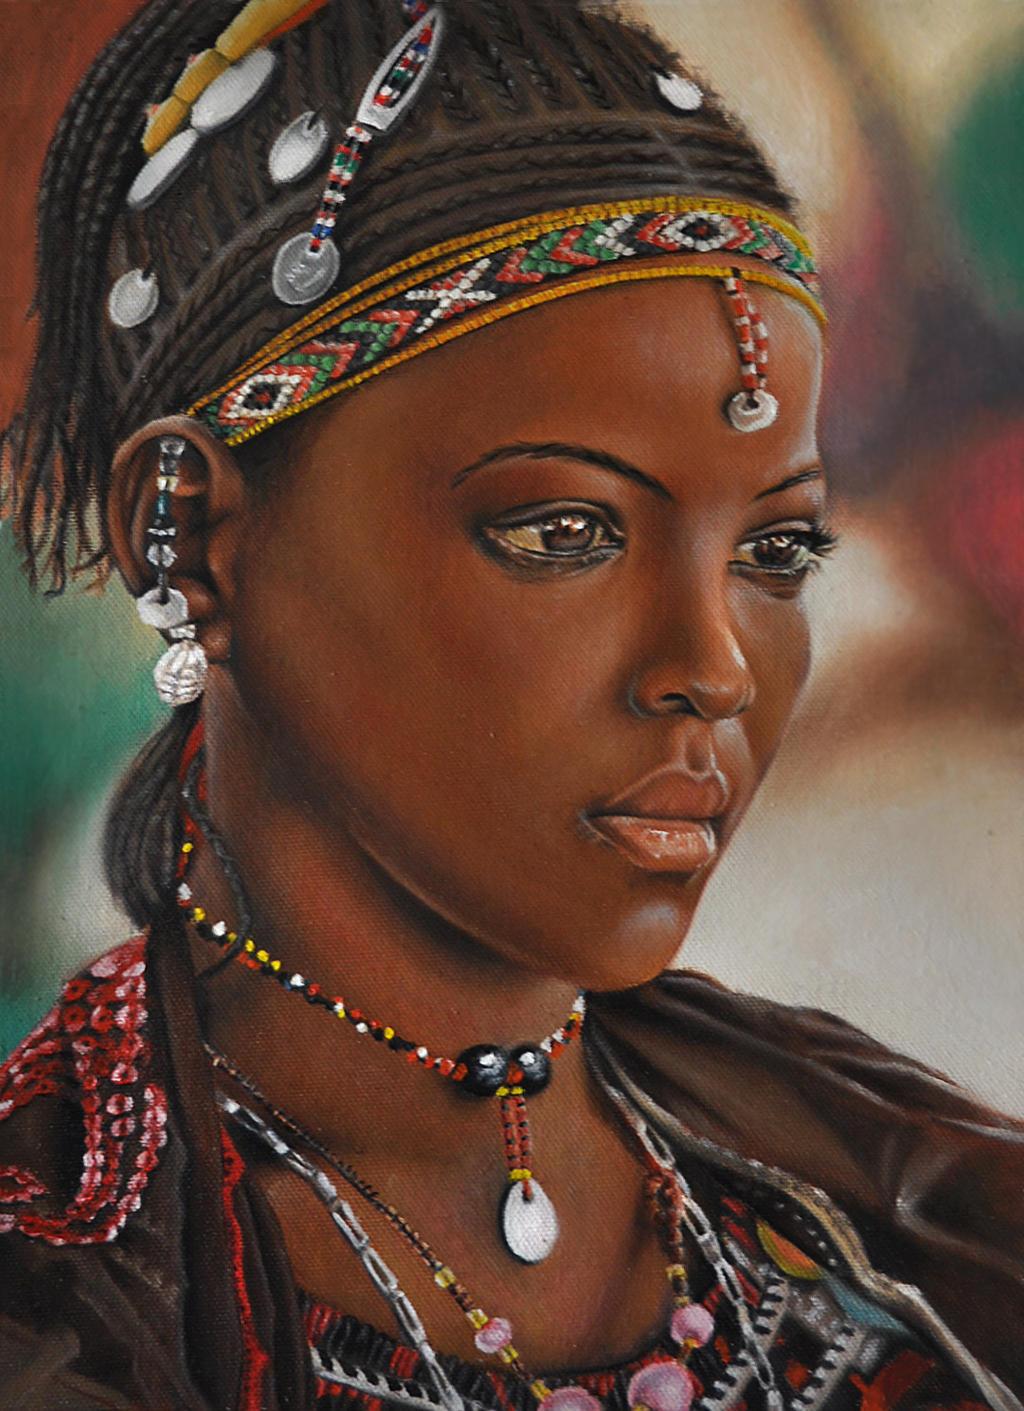 E >> Fulani girl - Nigeria by Lianne-Issa on DeviantArt